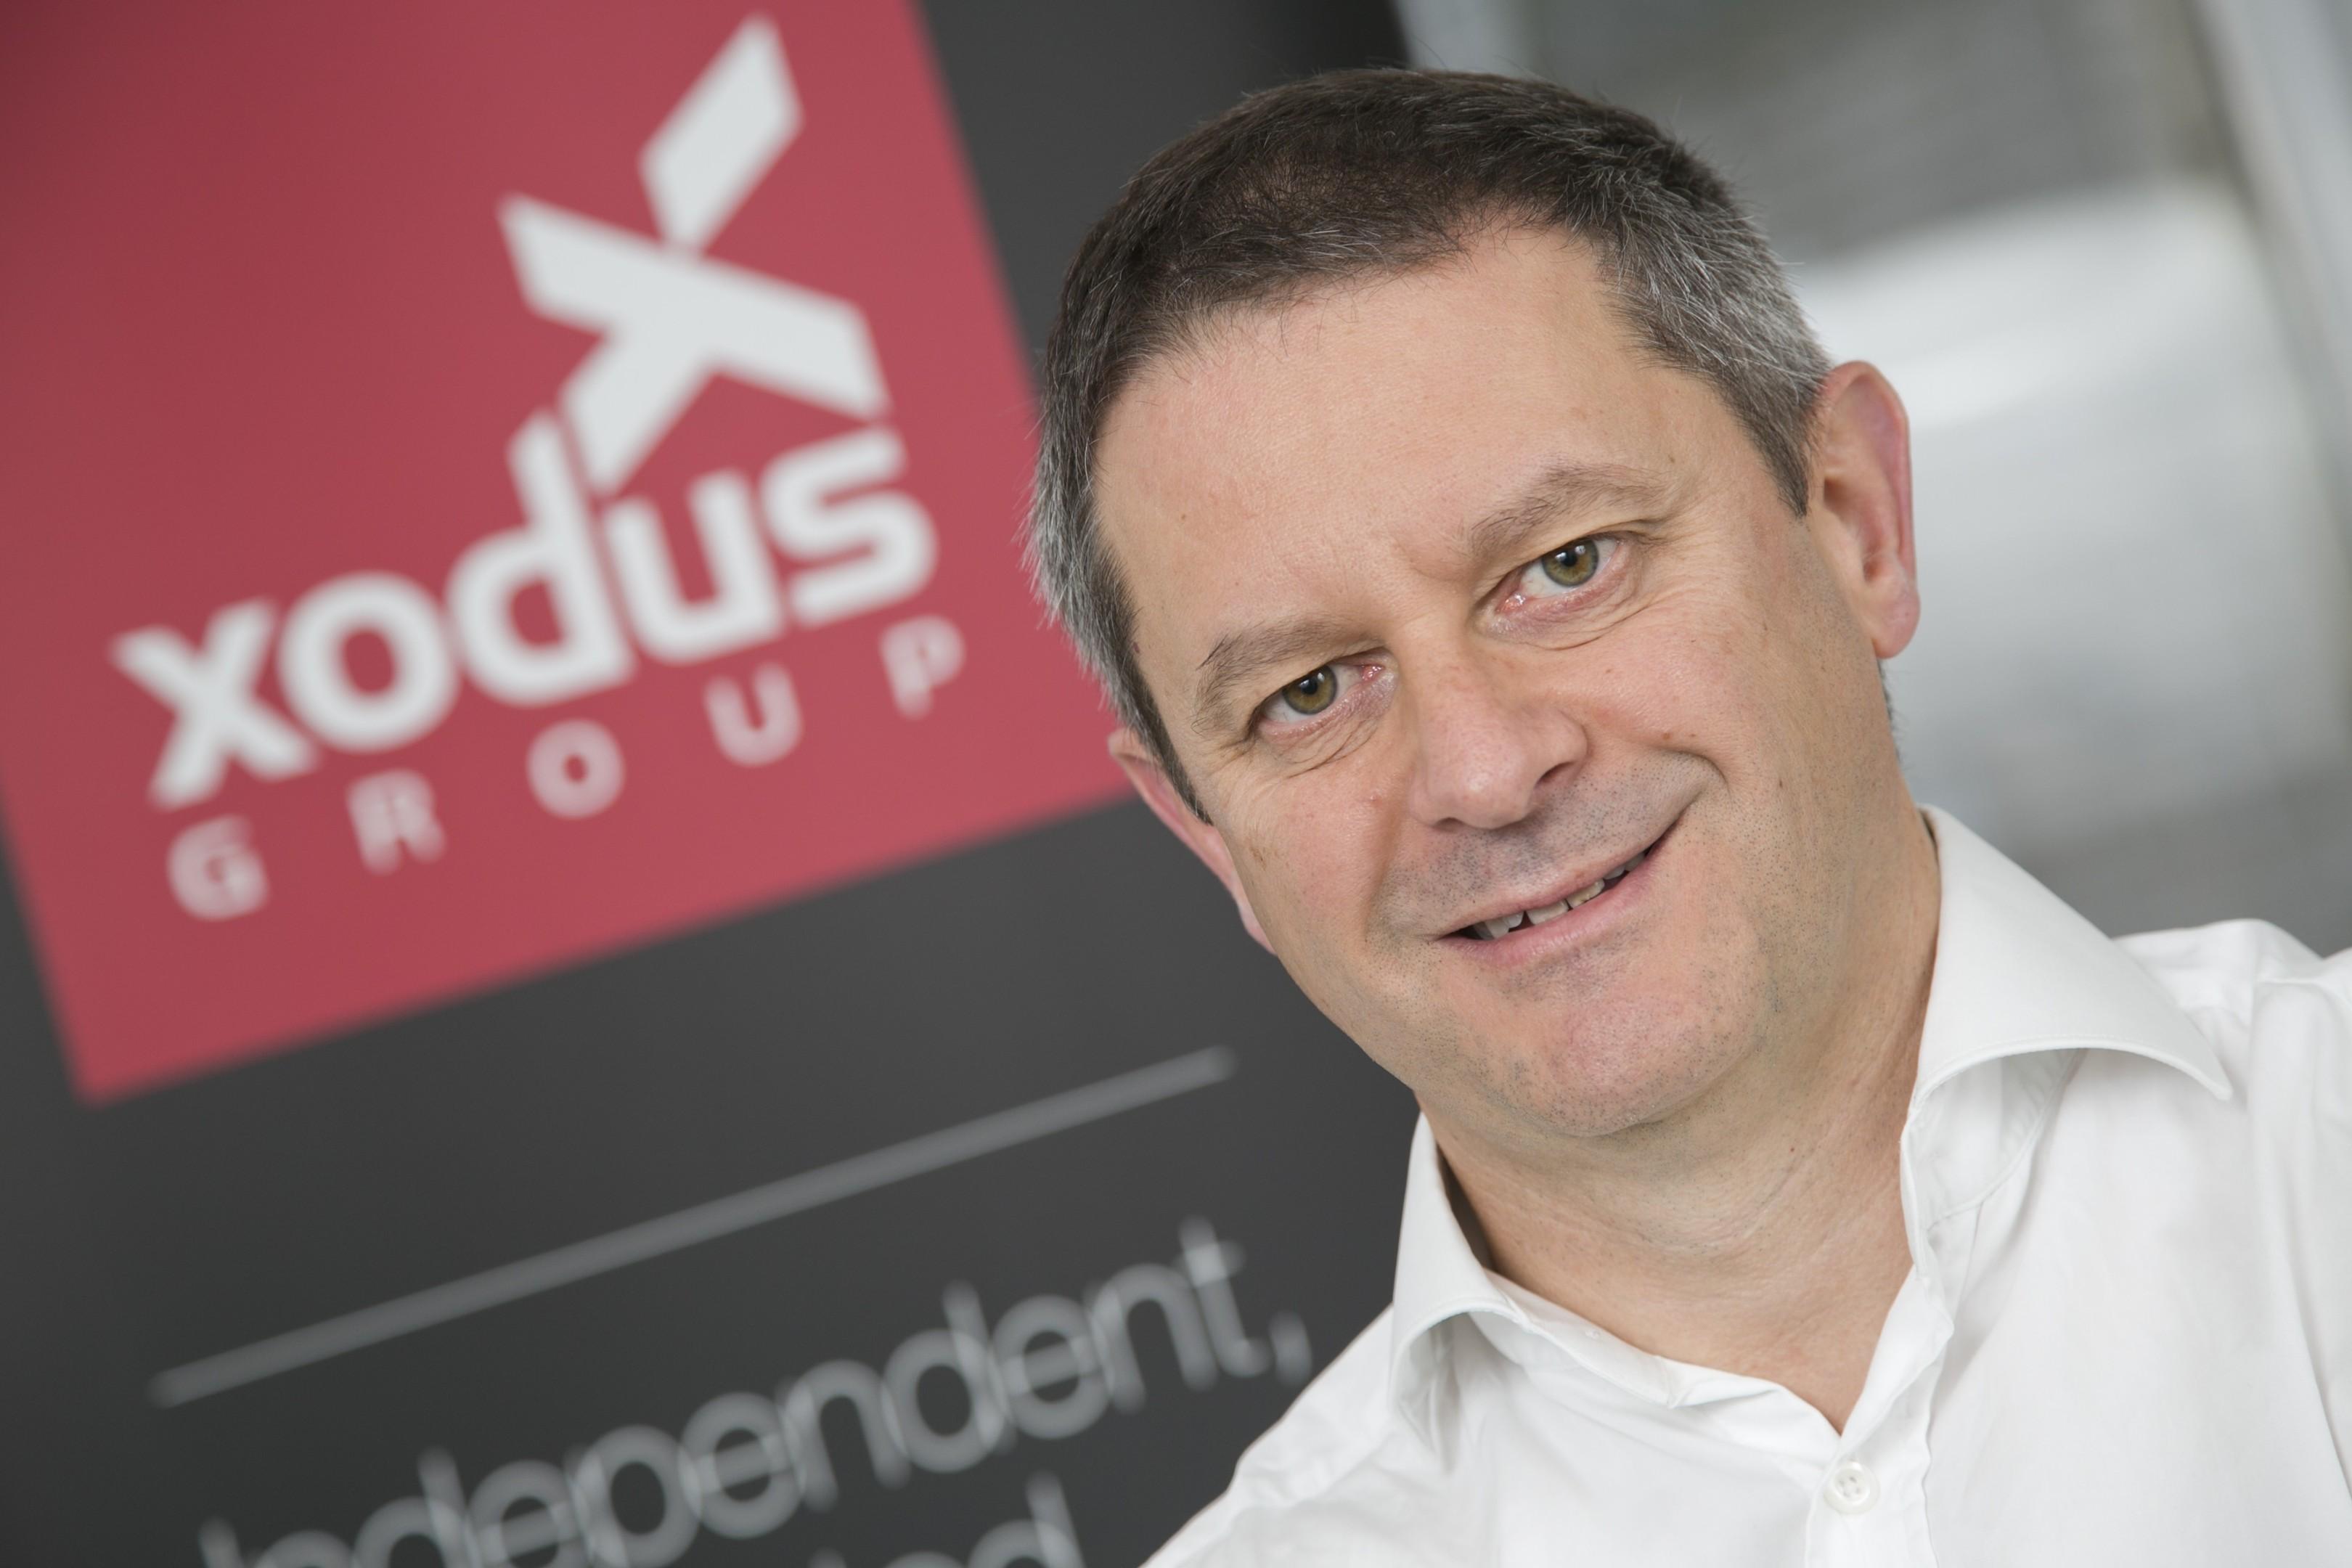 Xodus managing director Steve Swindell